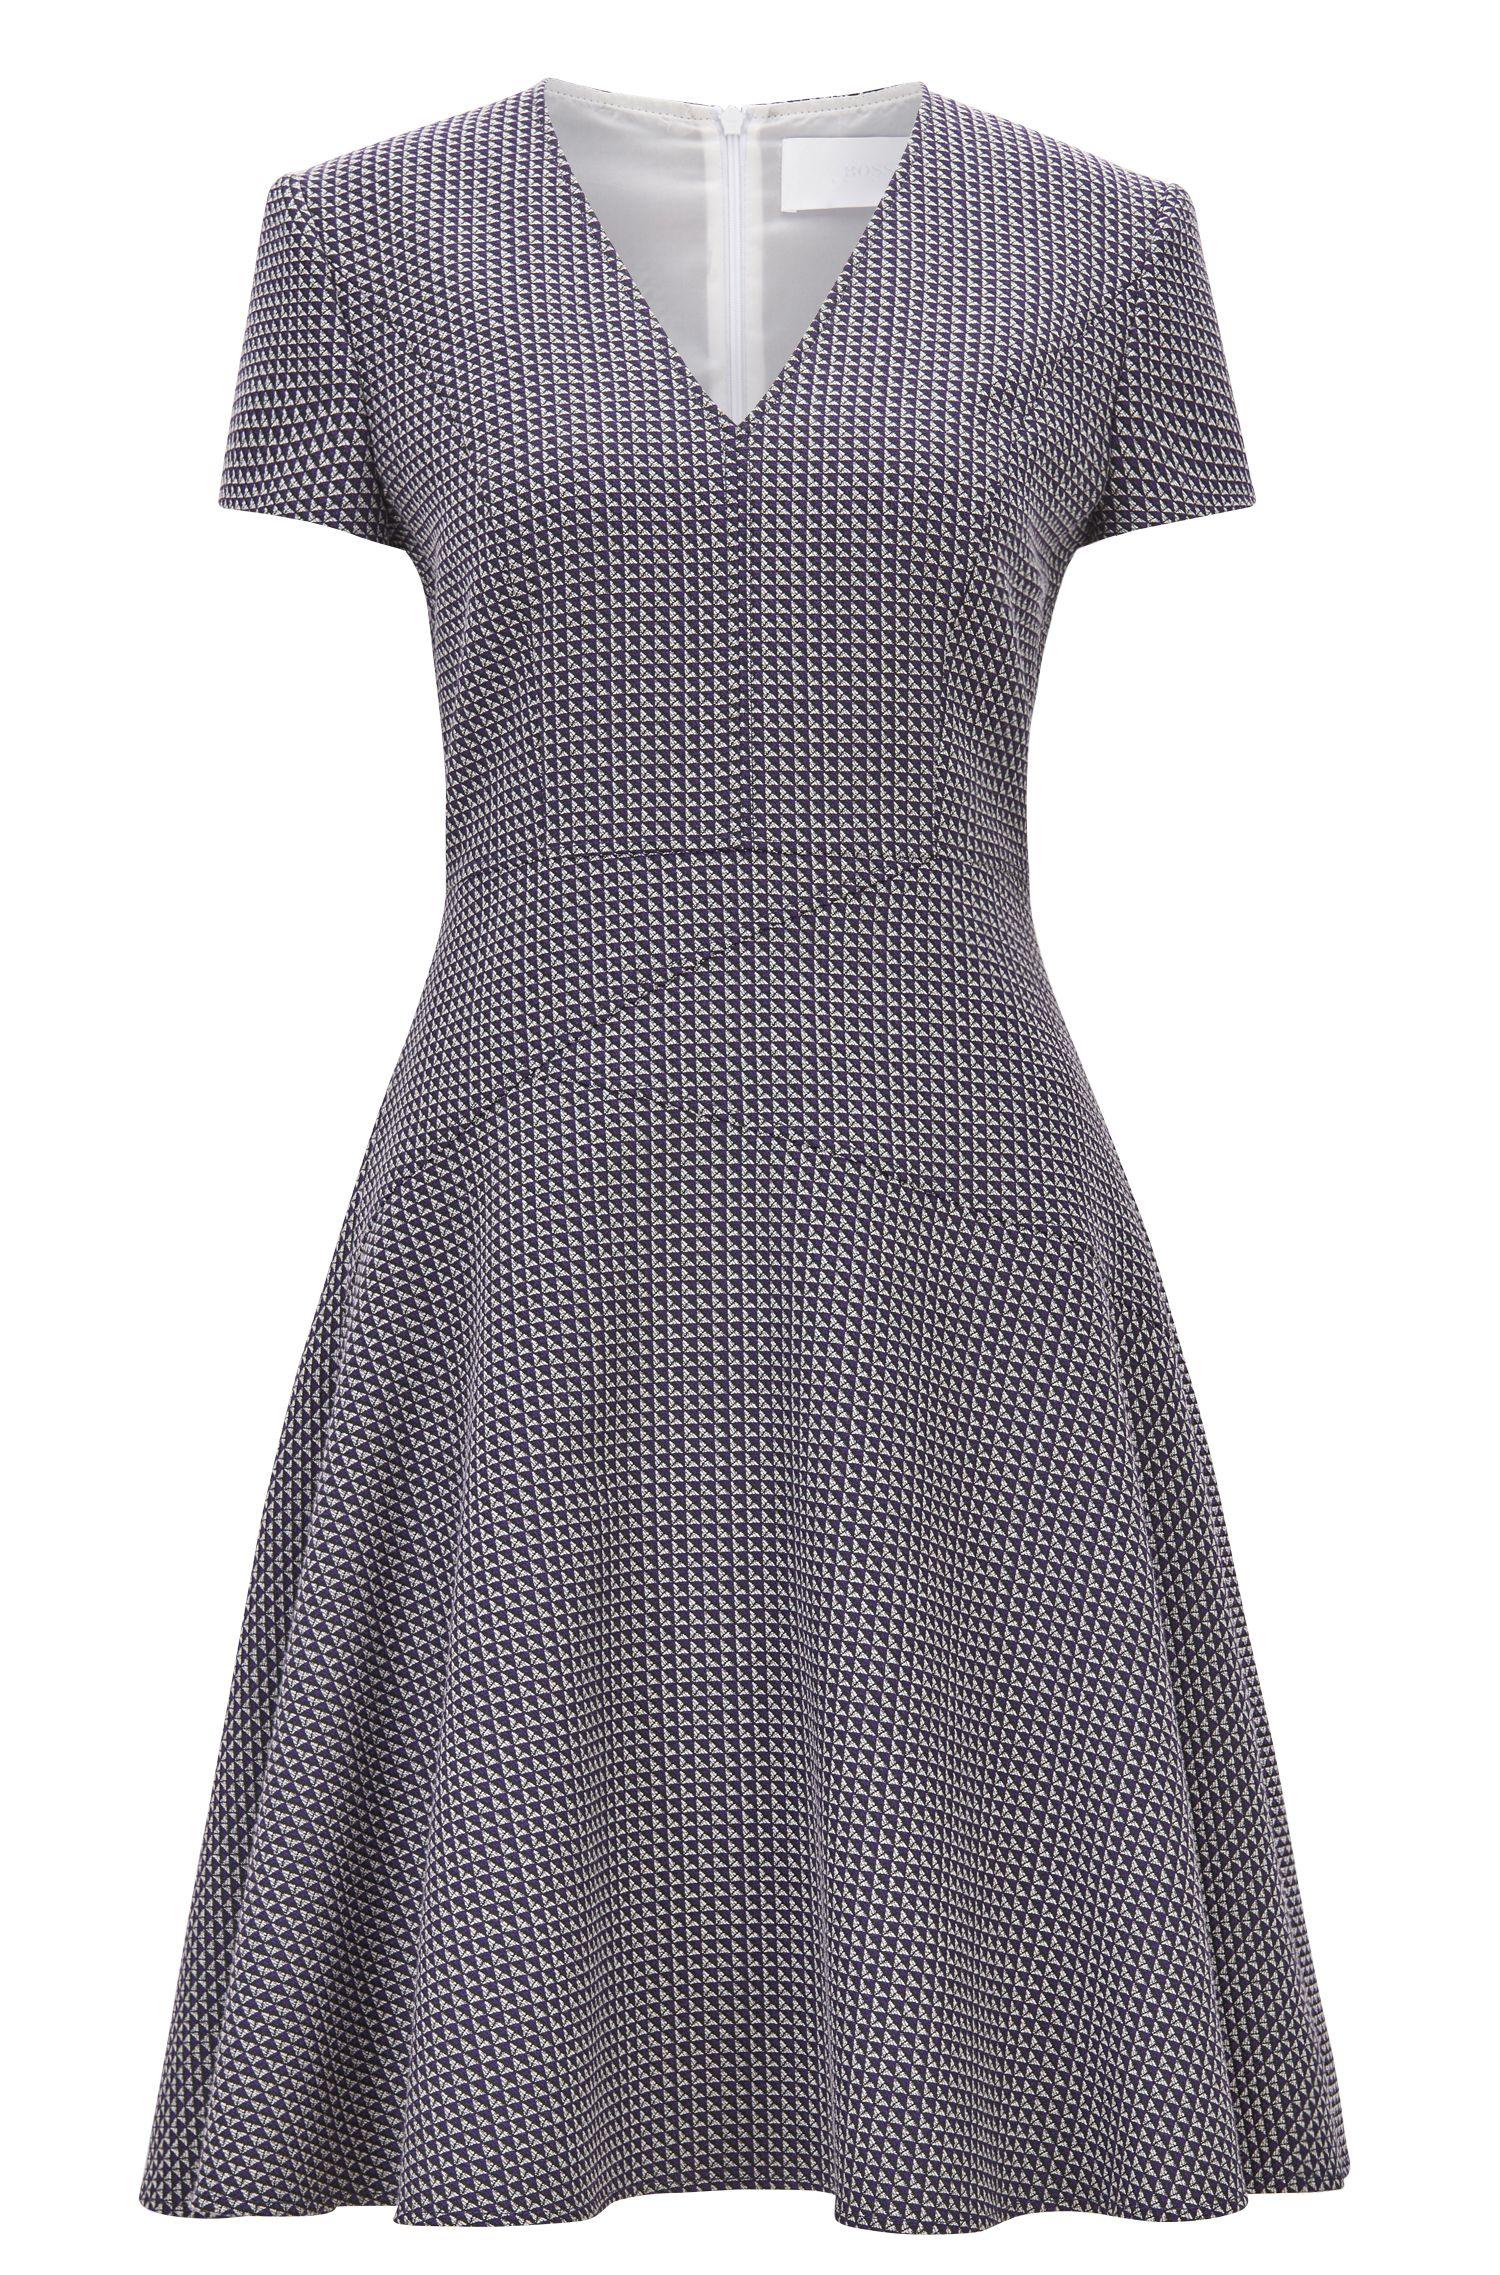 A-Linien-Kleid aus Jacquard, Gemustert